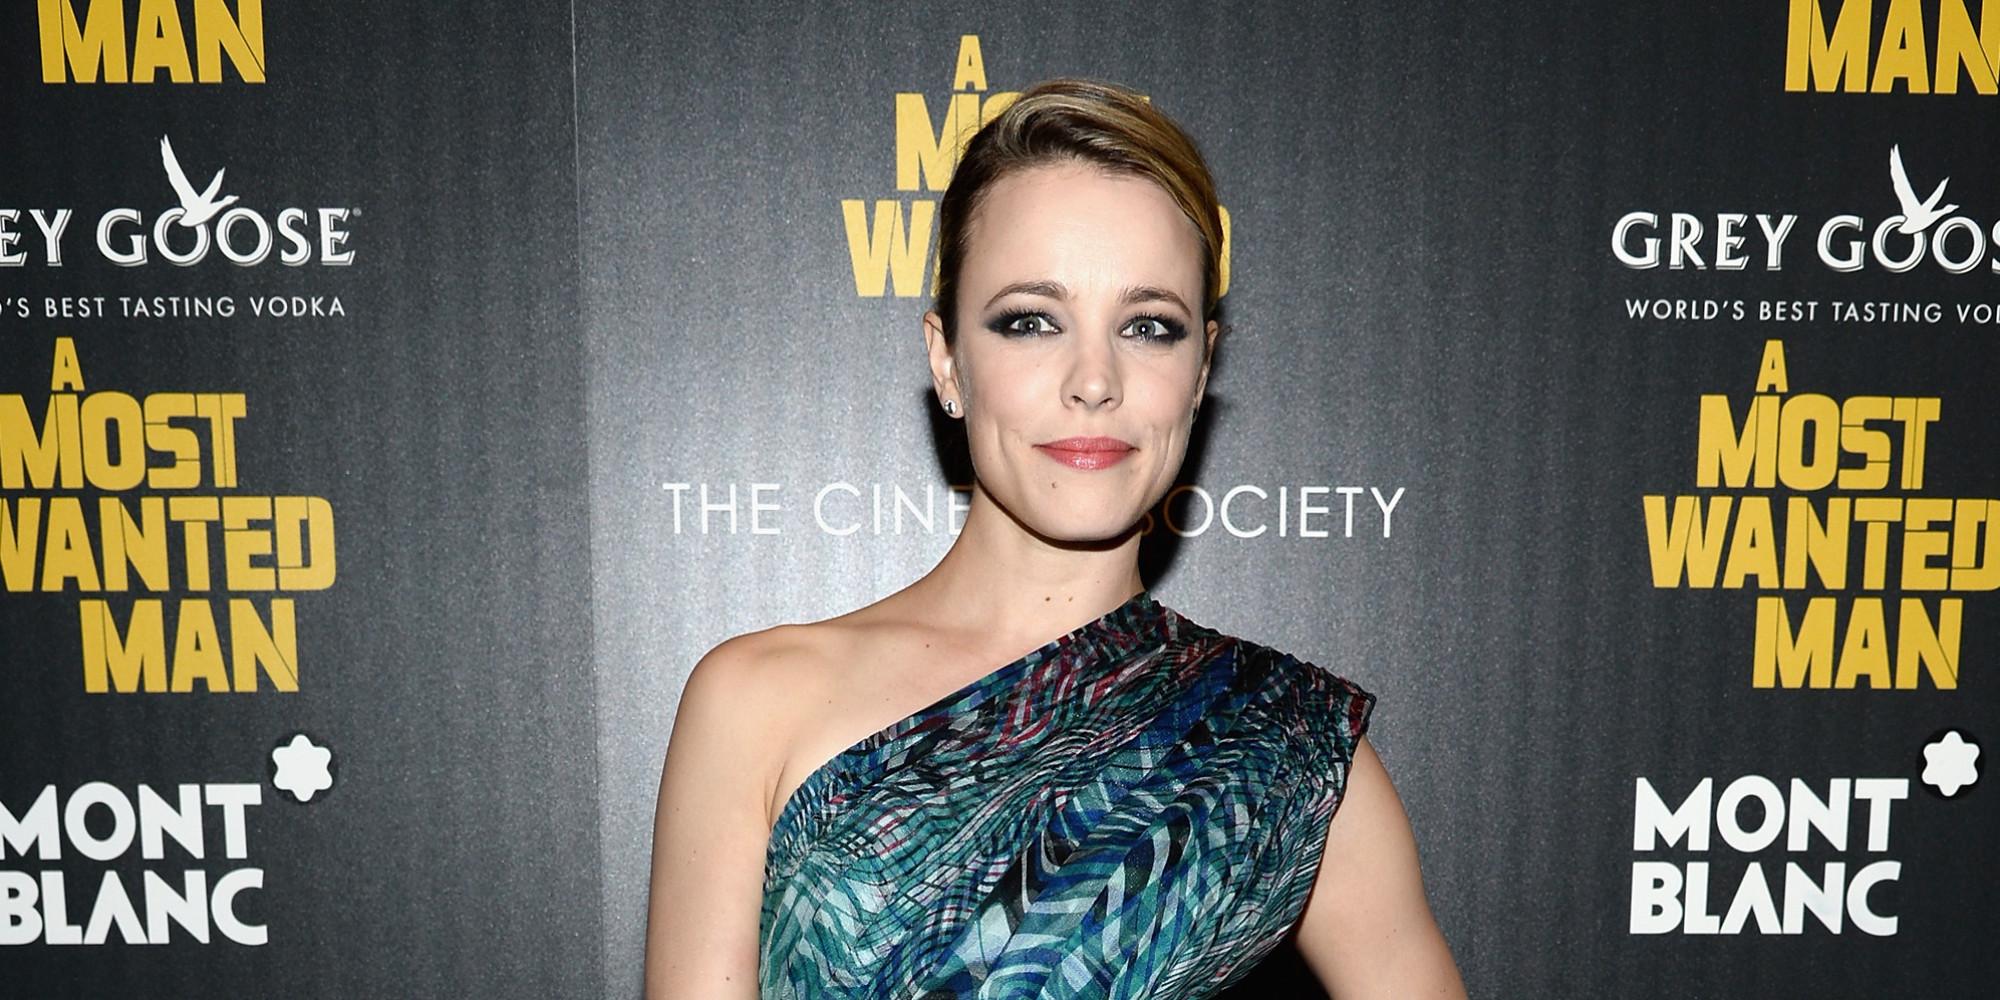 Rachel McAdams Dazzles In Print Dress On The Red Carpet Rachel Mcadams Facebook